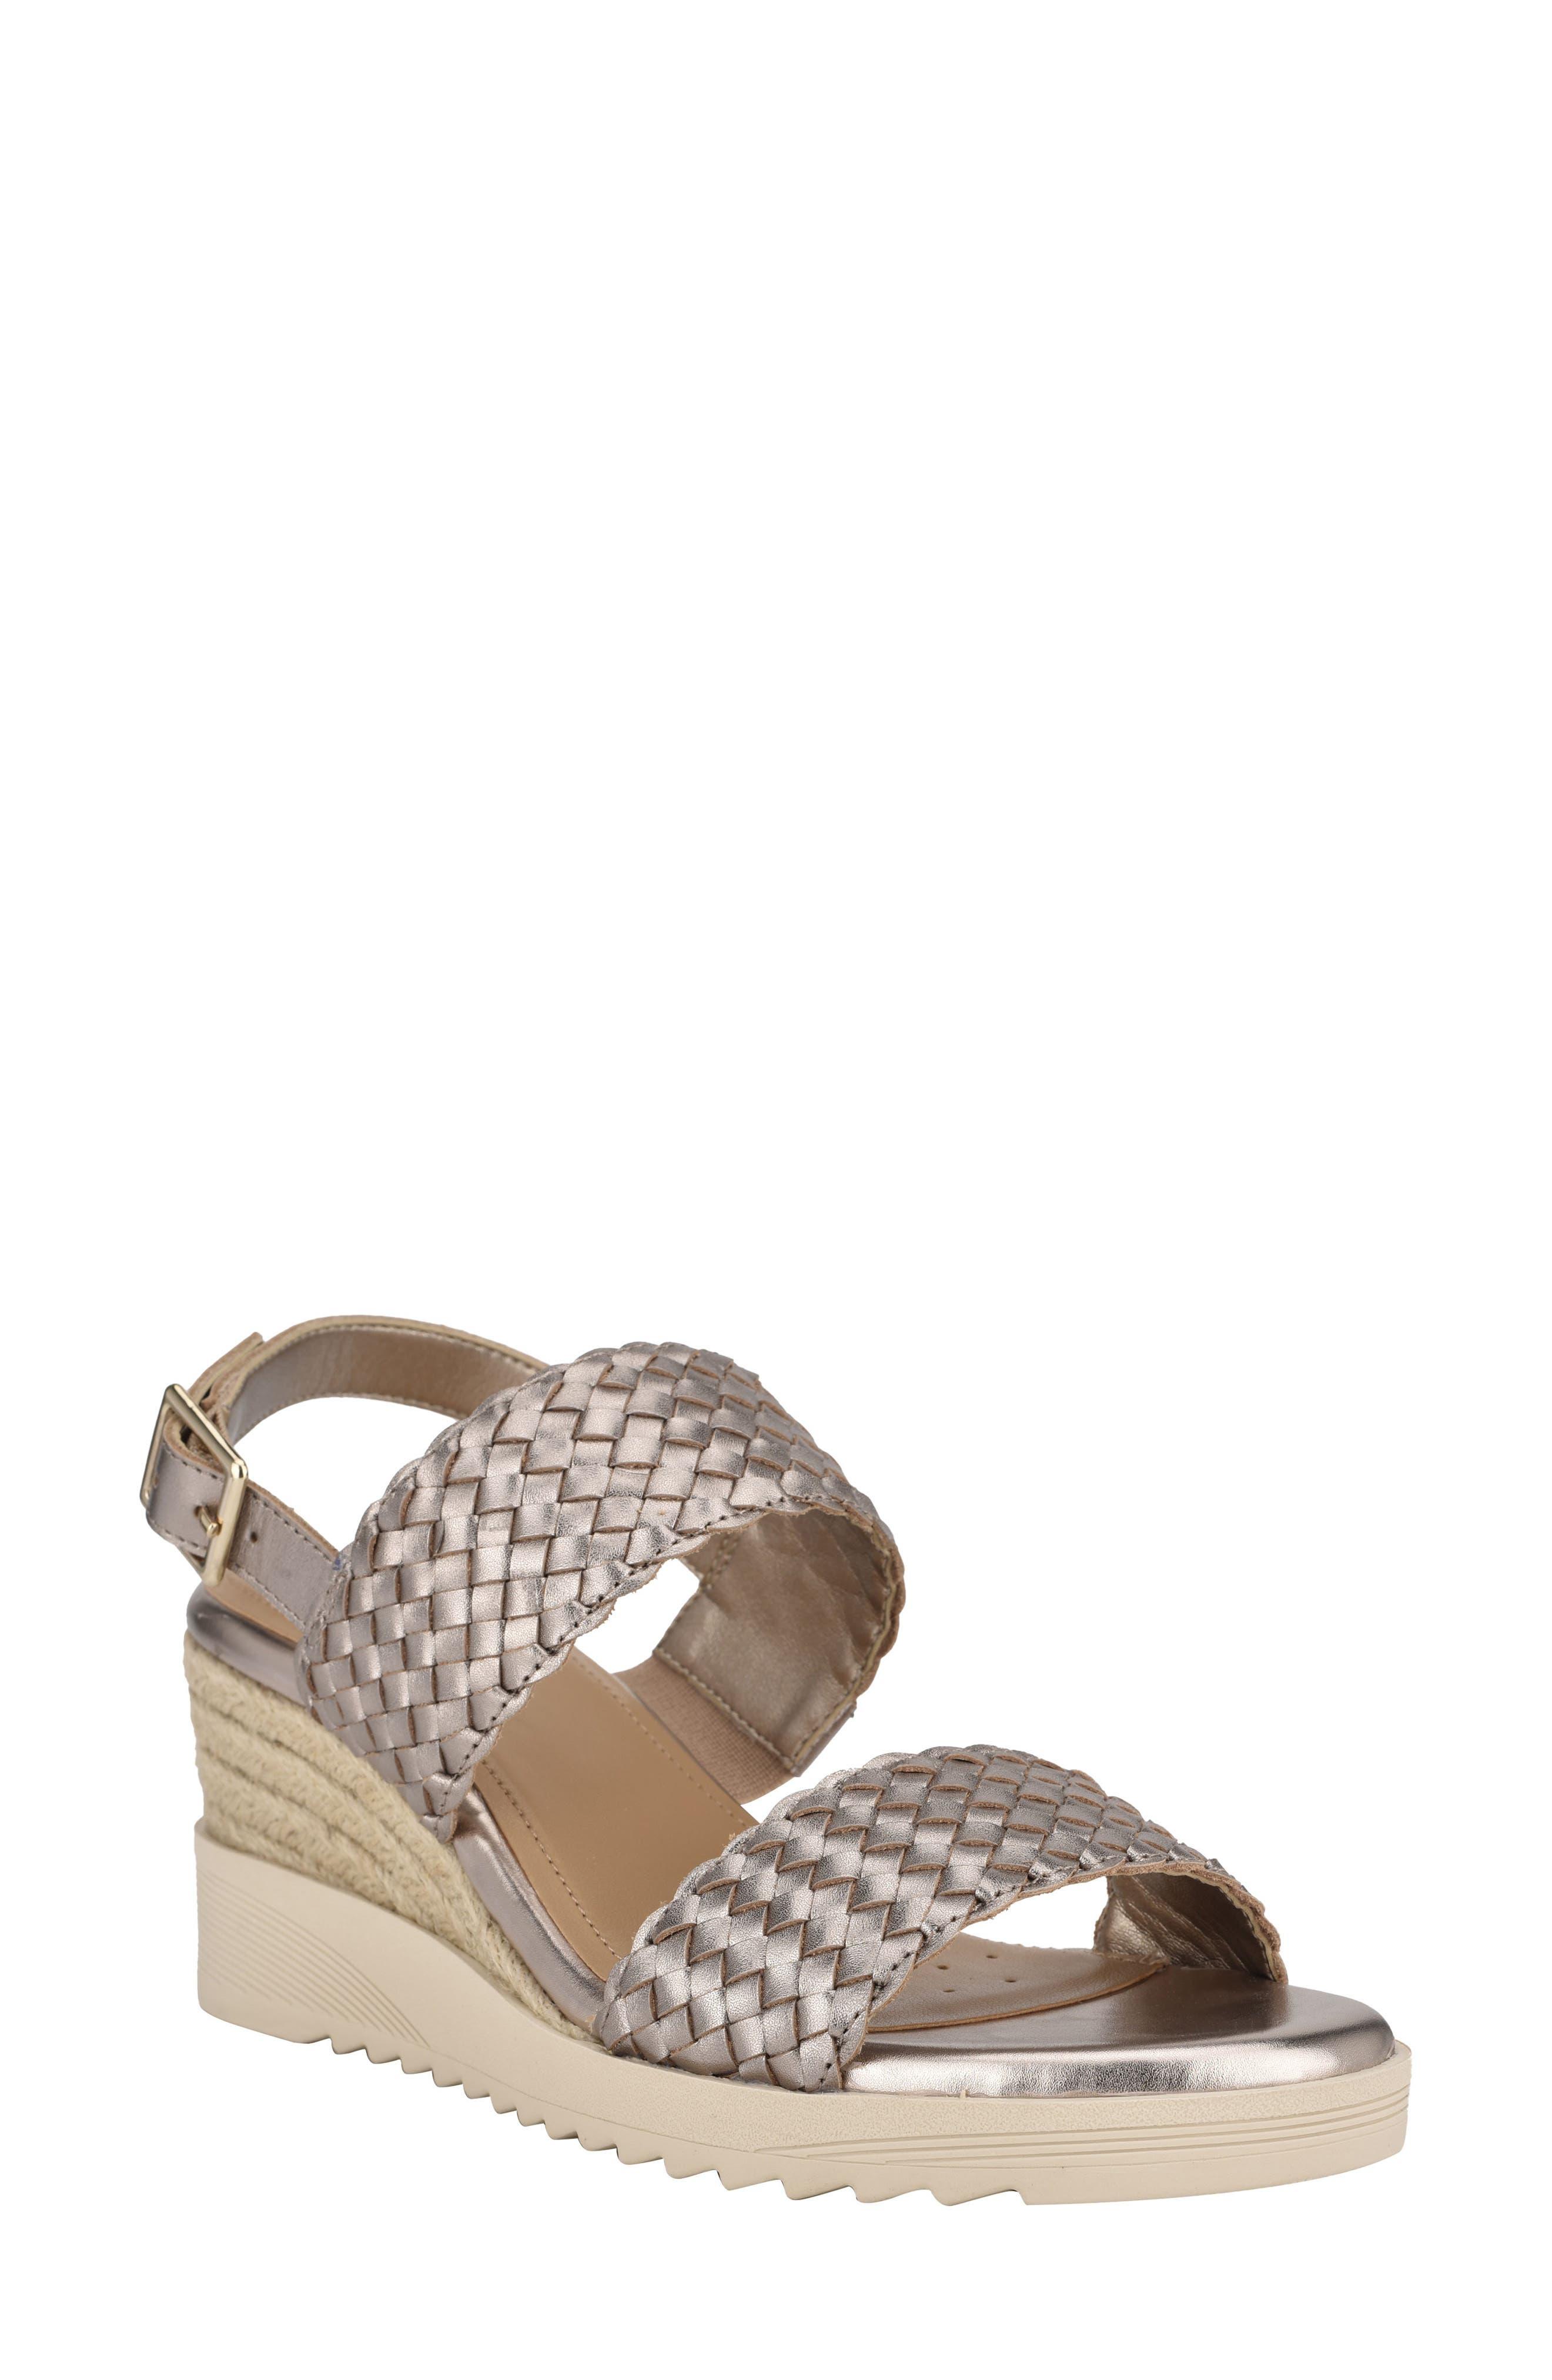 X Martha Stewart Zuri Wedge Sandal